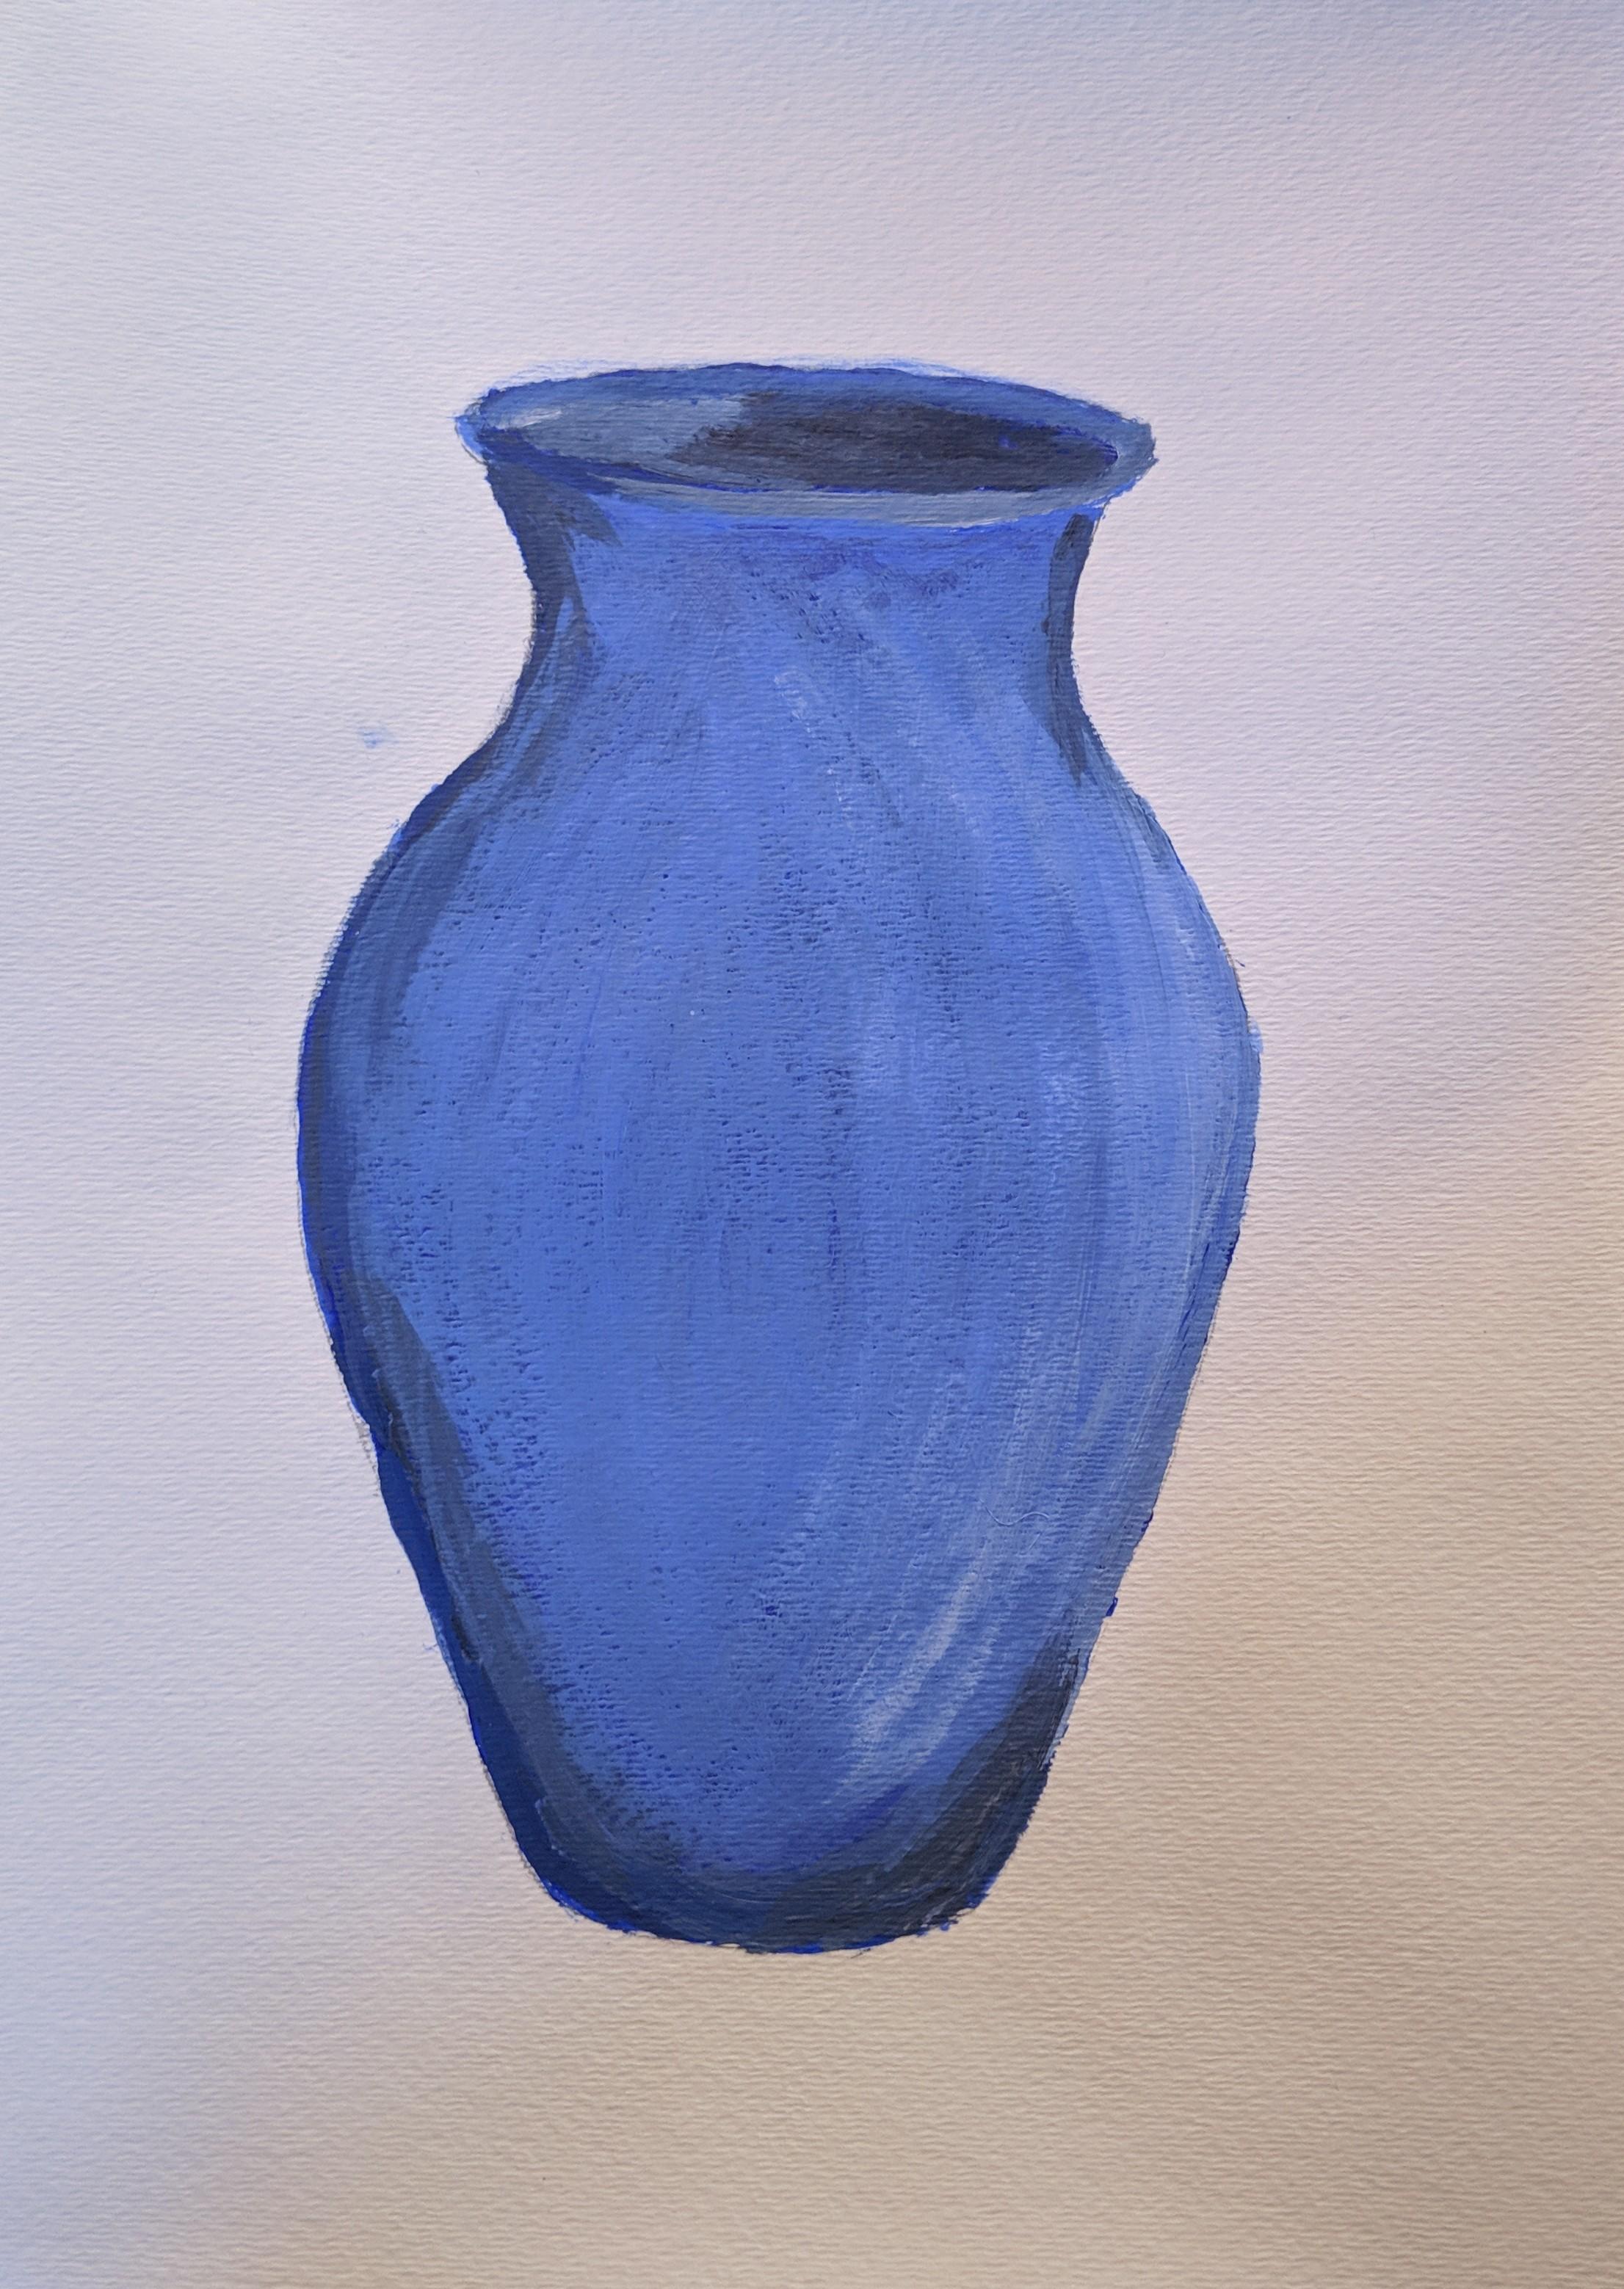 1st kintsugi vase no cracks_20190828_175343(1)